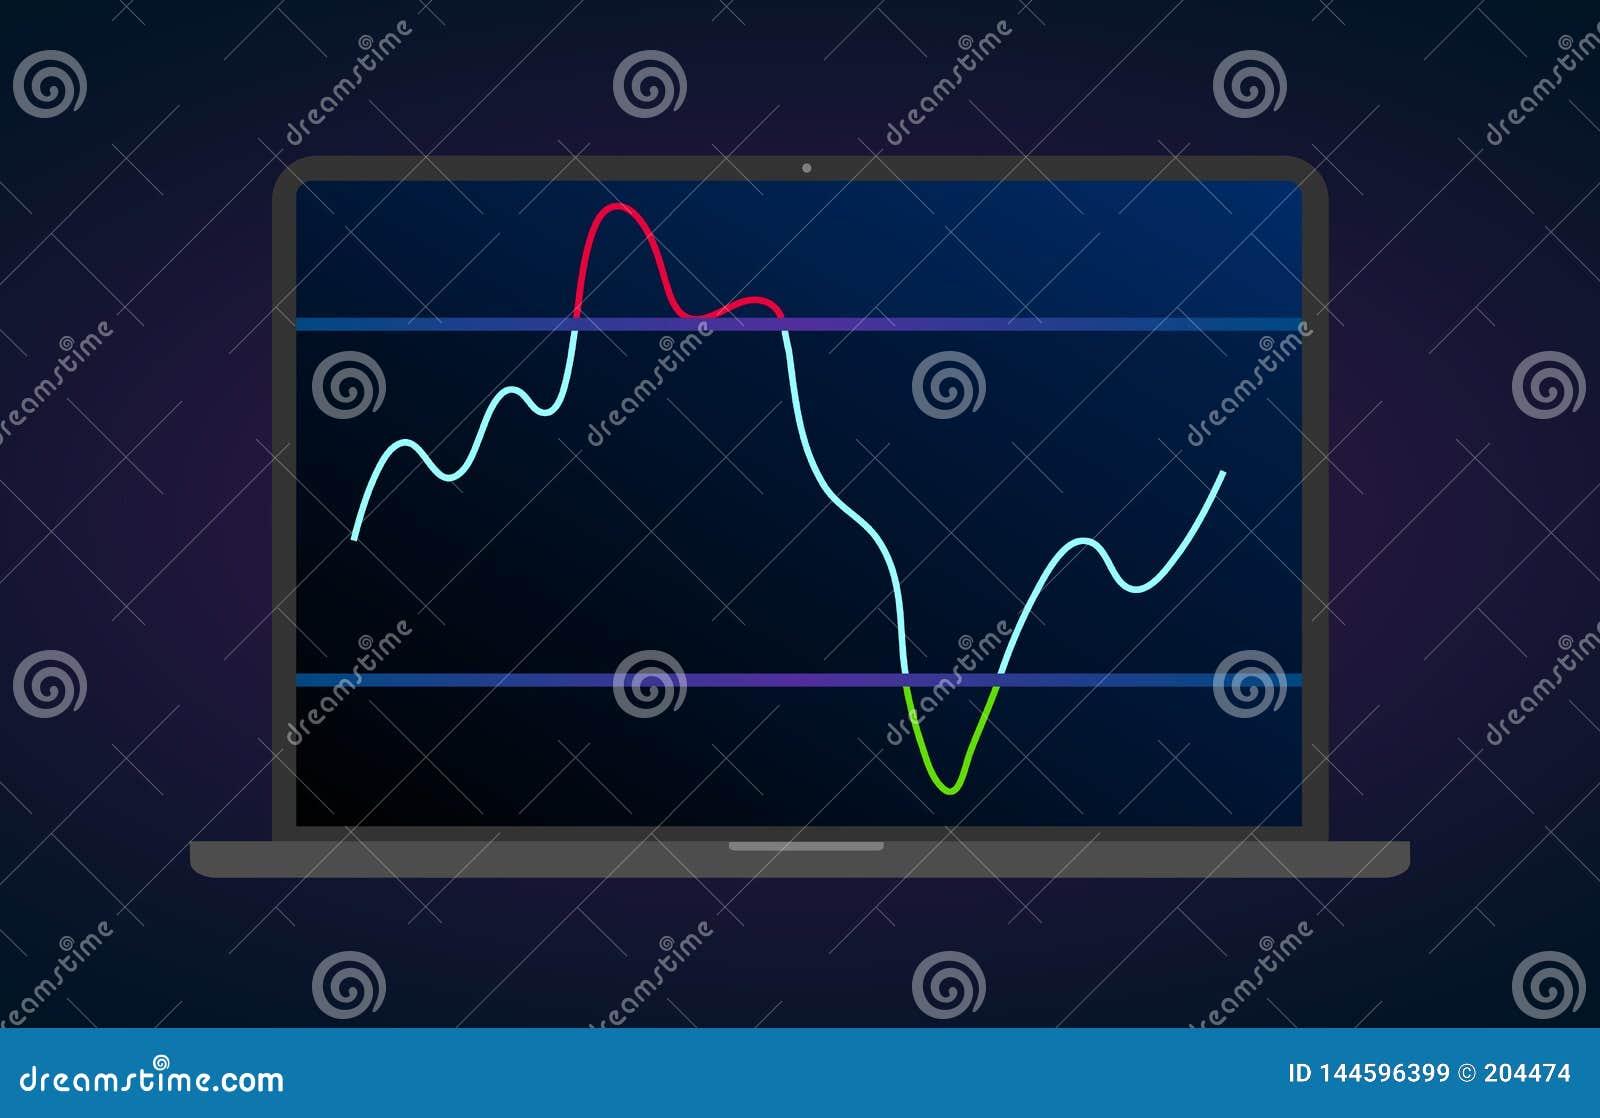 indice rsi bitcoin)